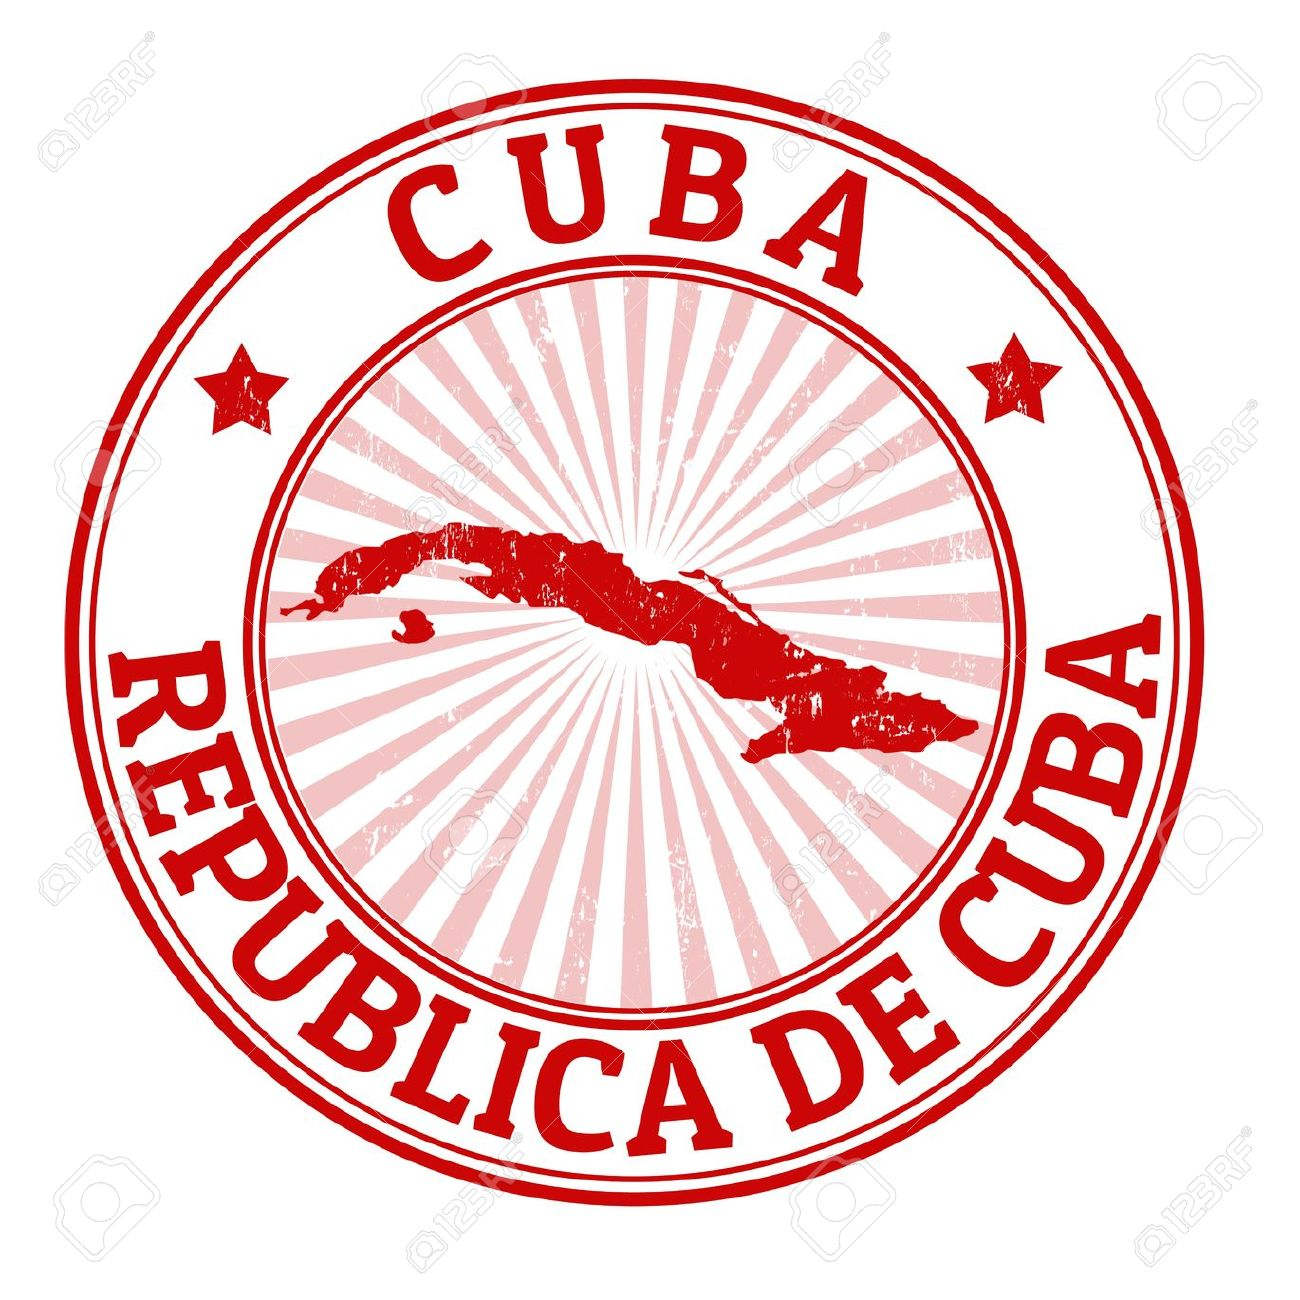 Cuba clipart #11, Download drawings